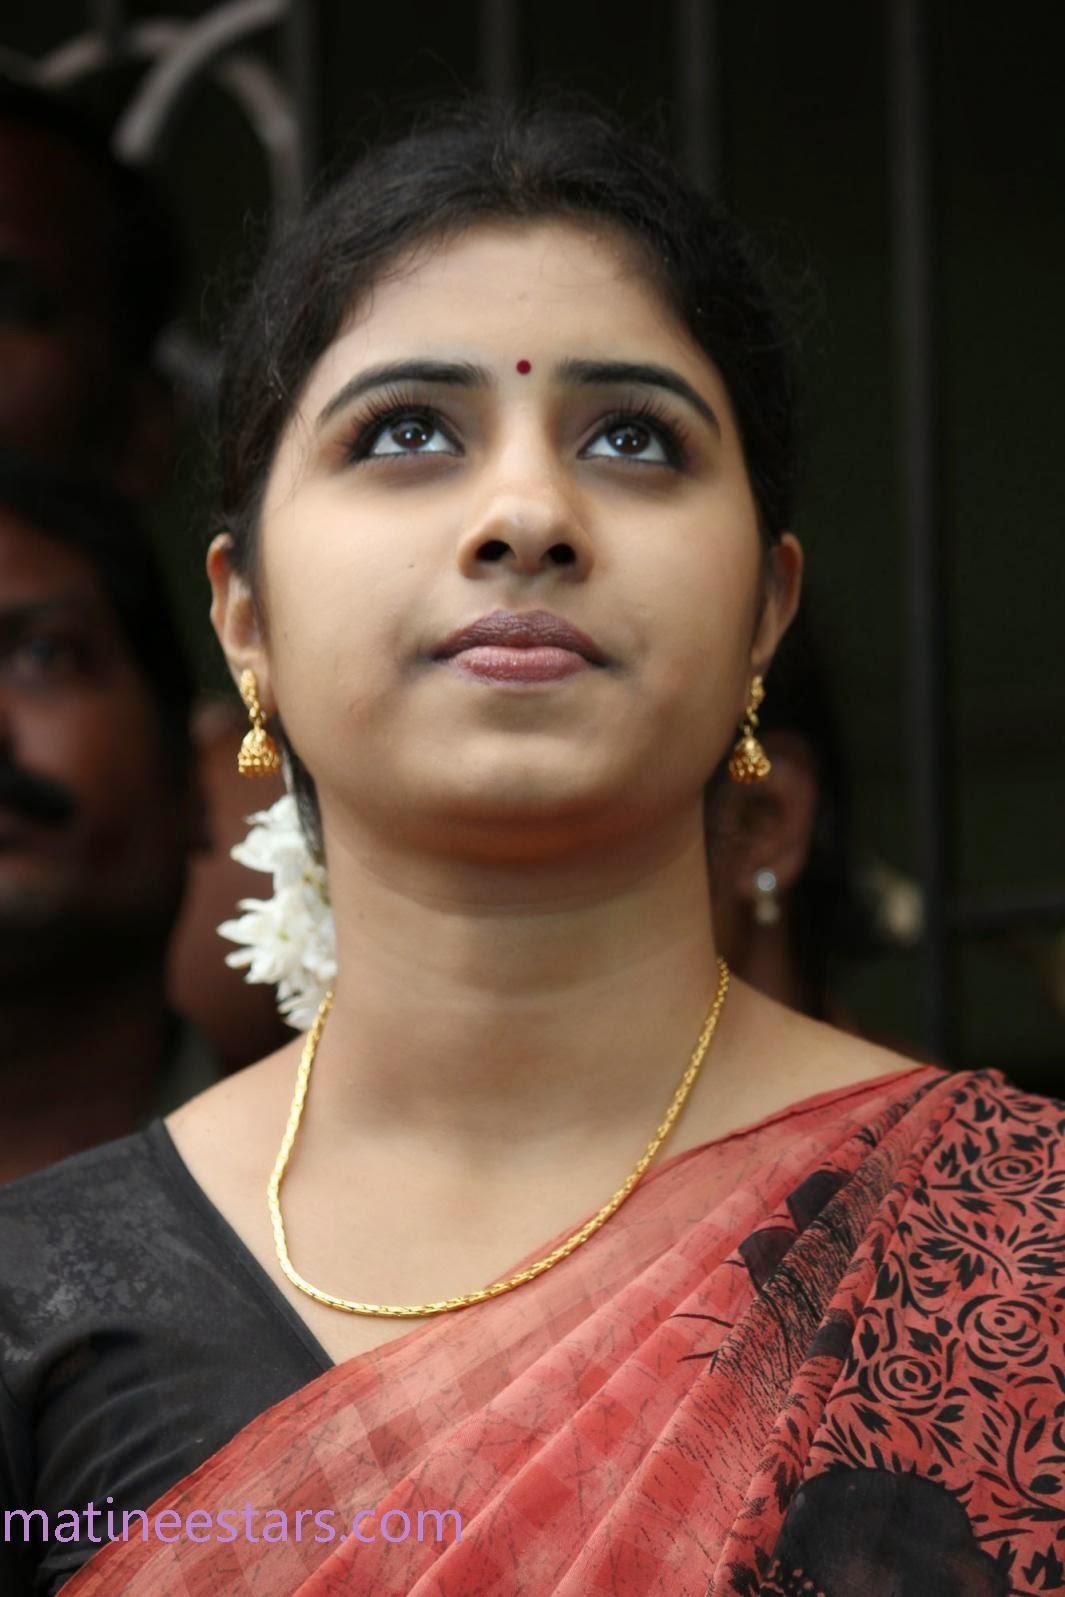 Read kanakku Teacher Malayalam Kambikatha PDf , Kochupusthakam 2014 new Malayalam Kambikatha collections - darshita-in-jacky-tamil-movie-stills-12-large